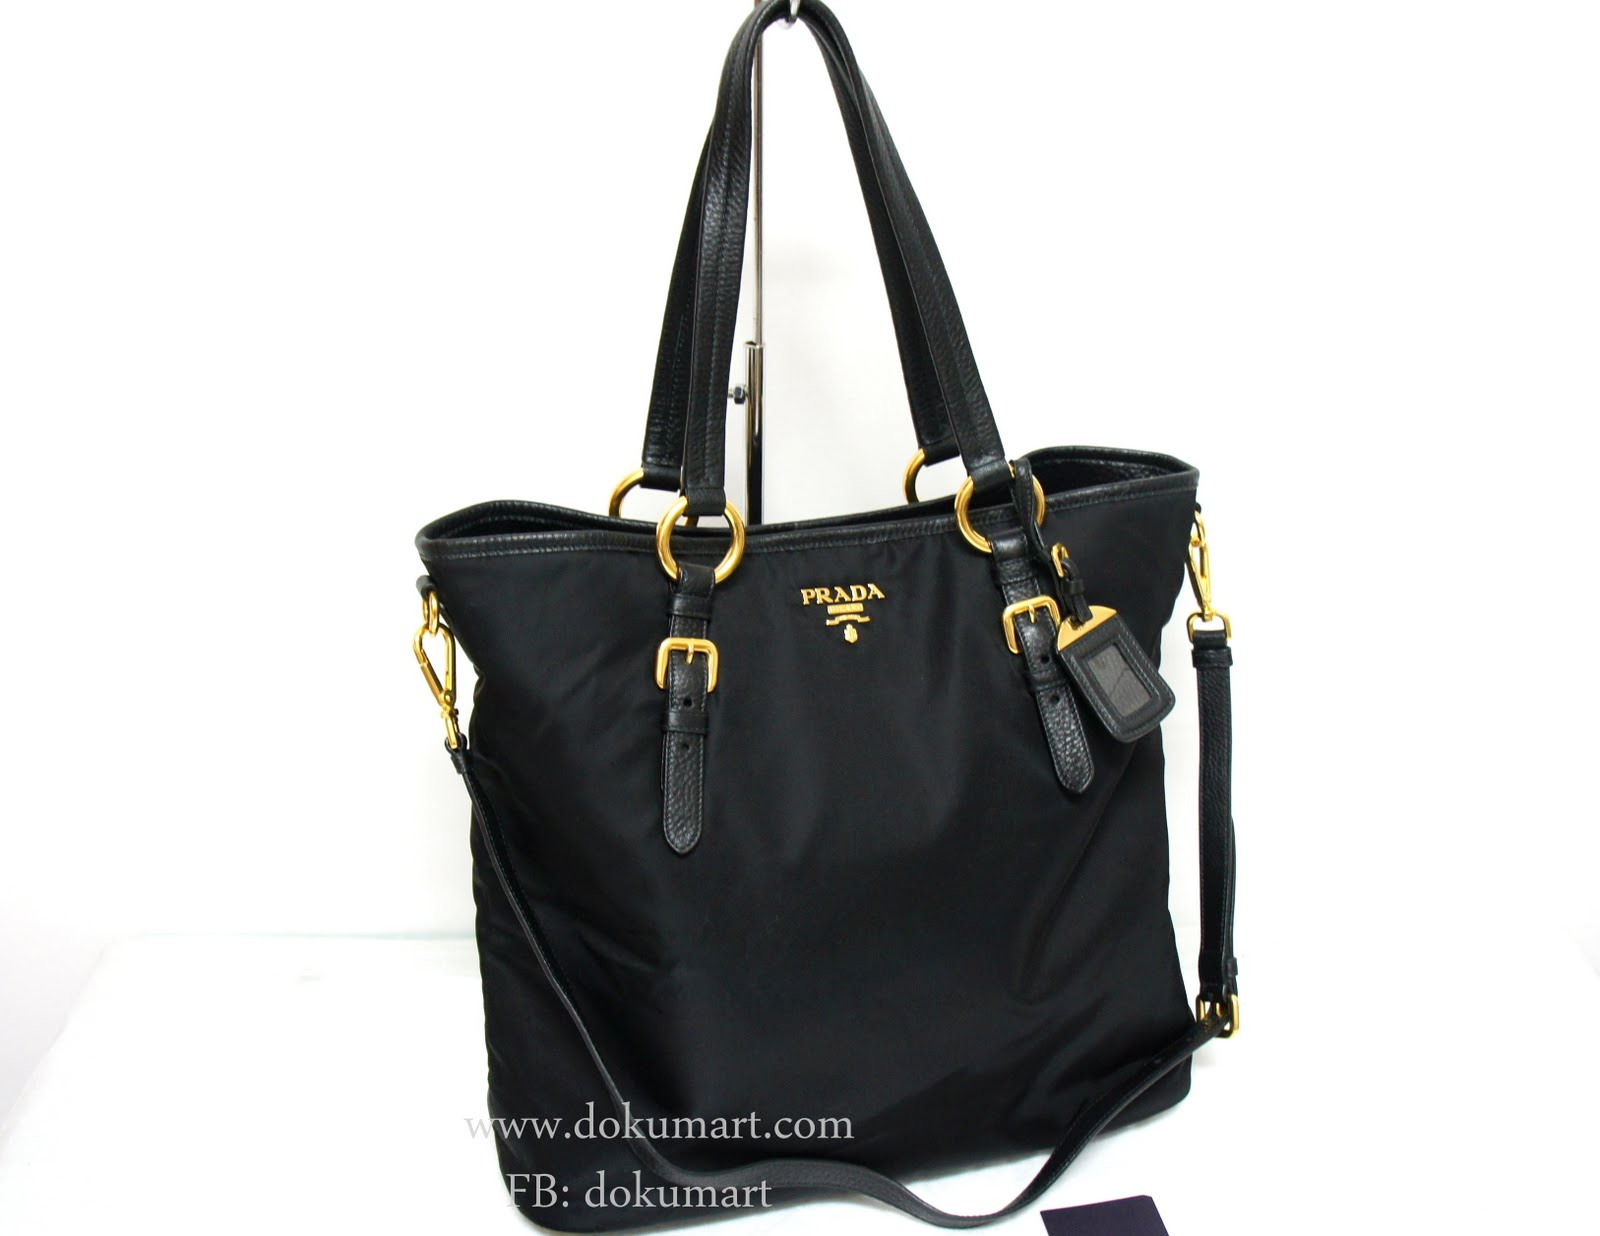 Prada Tessuto Vit. Dai Shopping Tote BR4365 - Dokumart